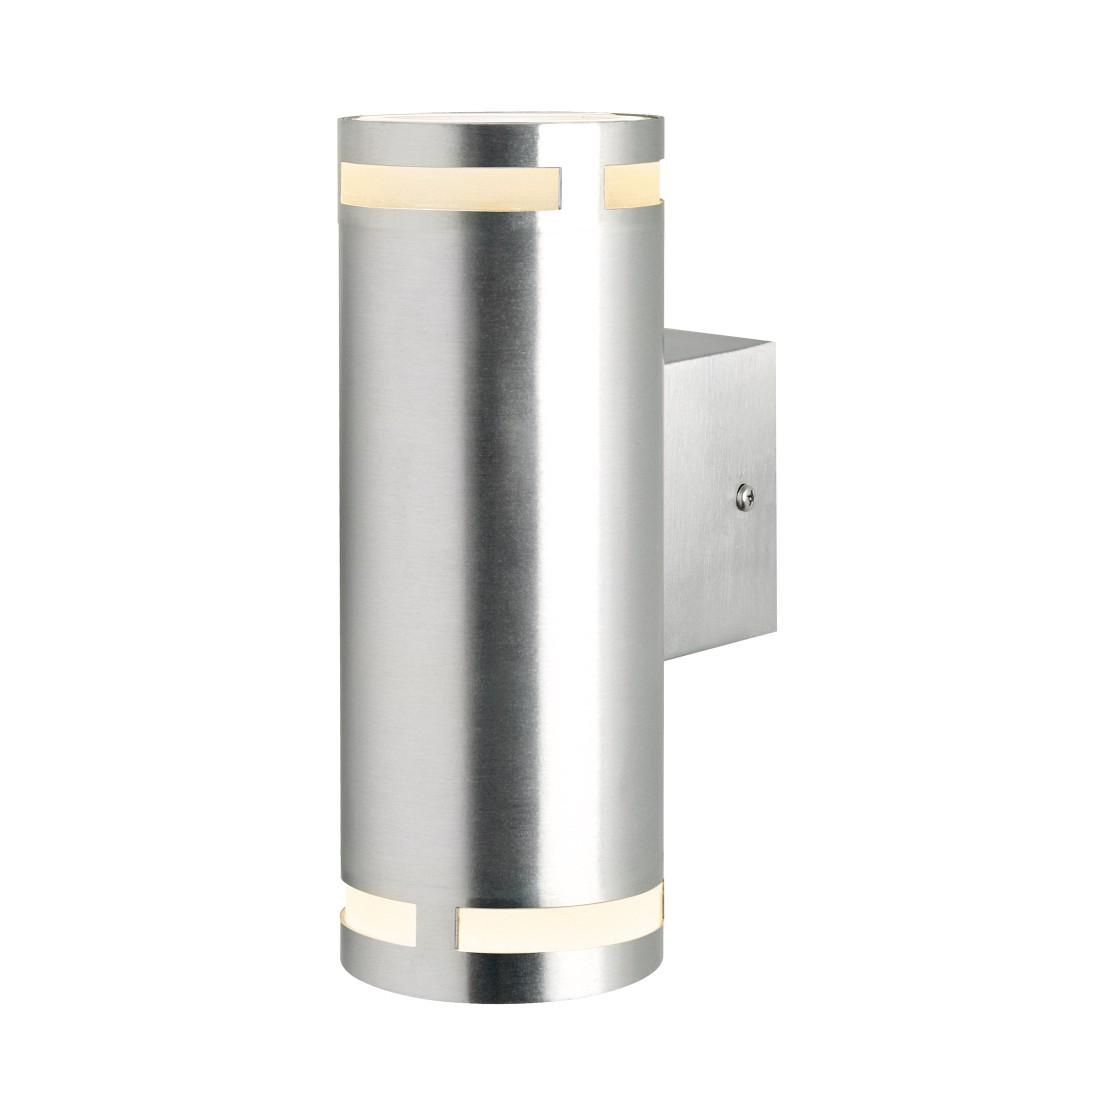 EEK A++, Wandstrahler 2-seitig Can Maxi II - Aluminium, Nordlux